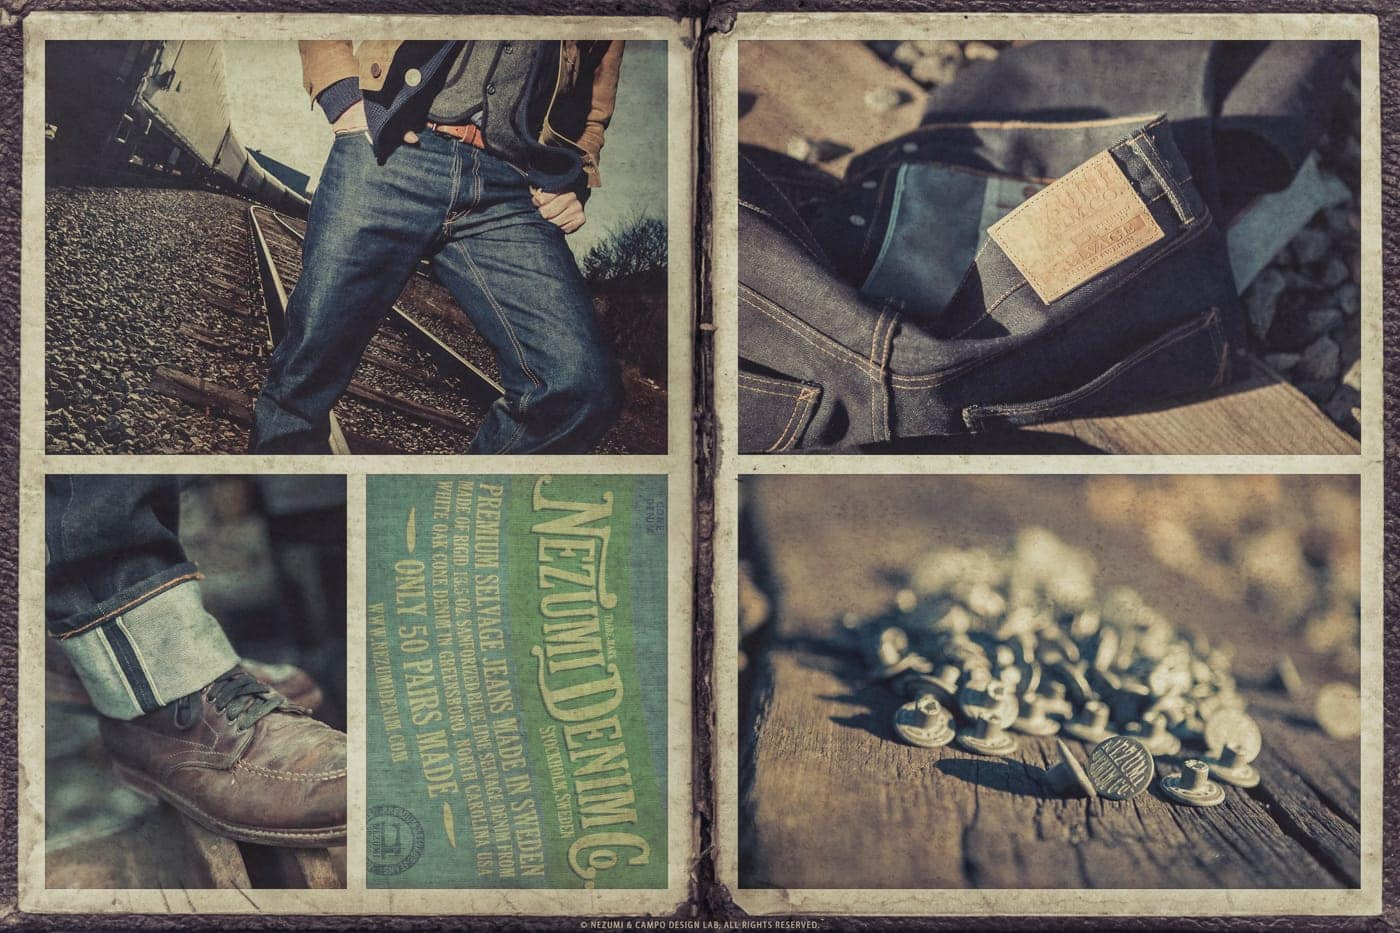 Nezumi Studios denim jeans apparel clothing collection